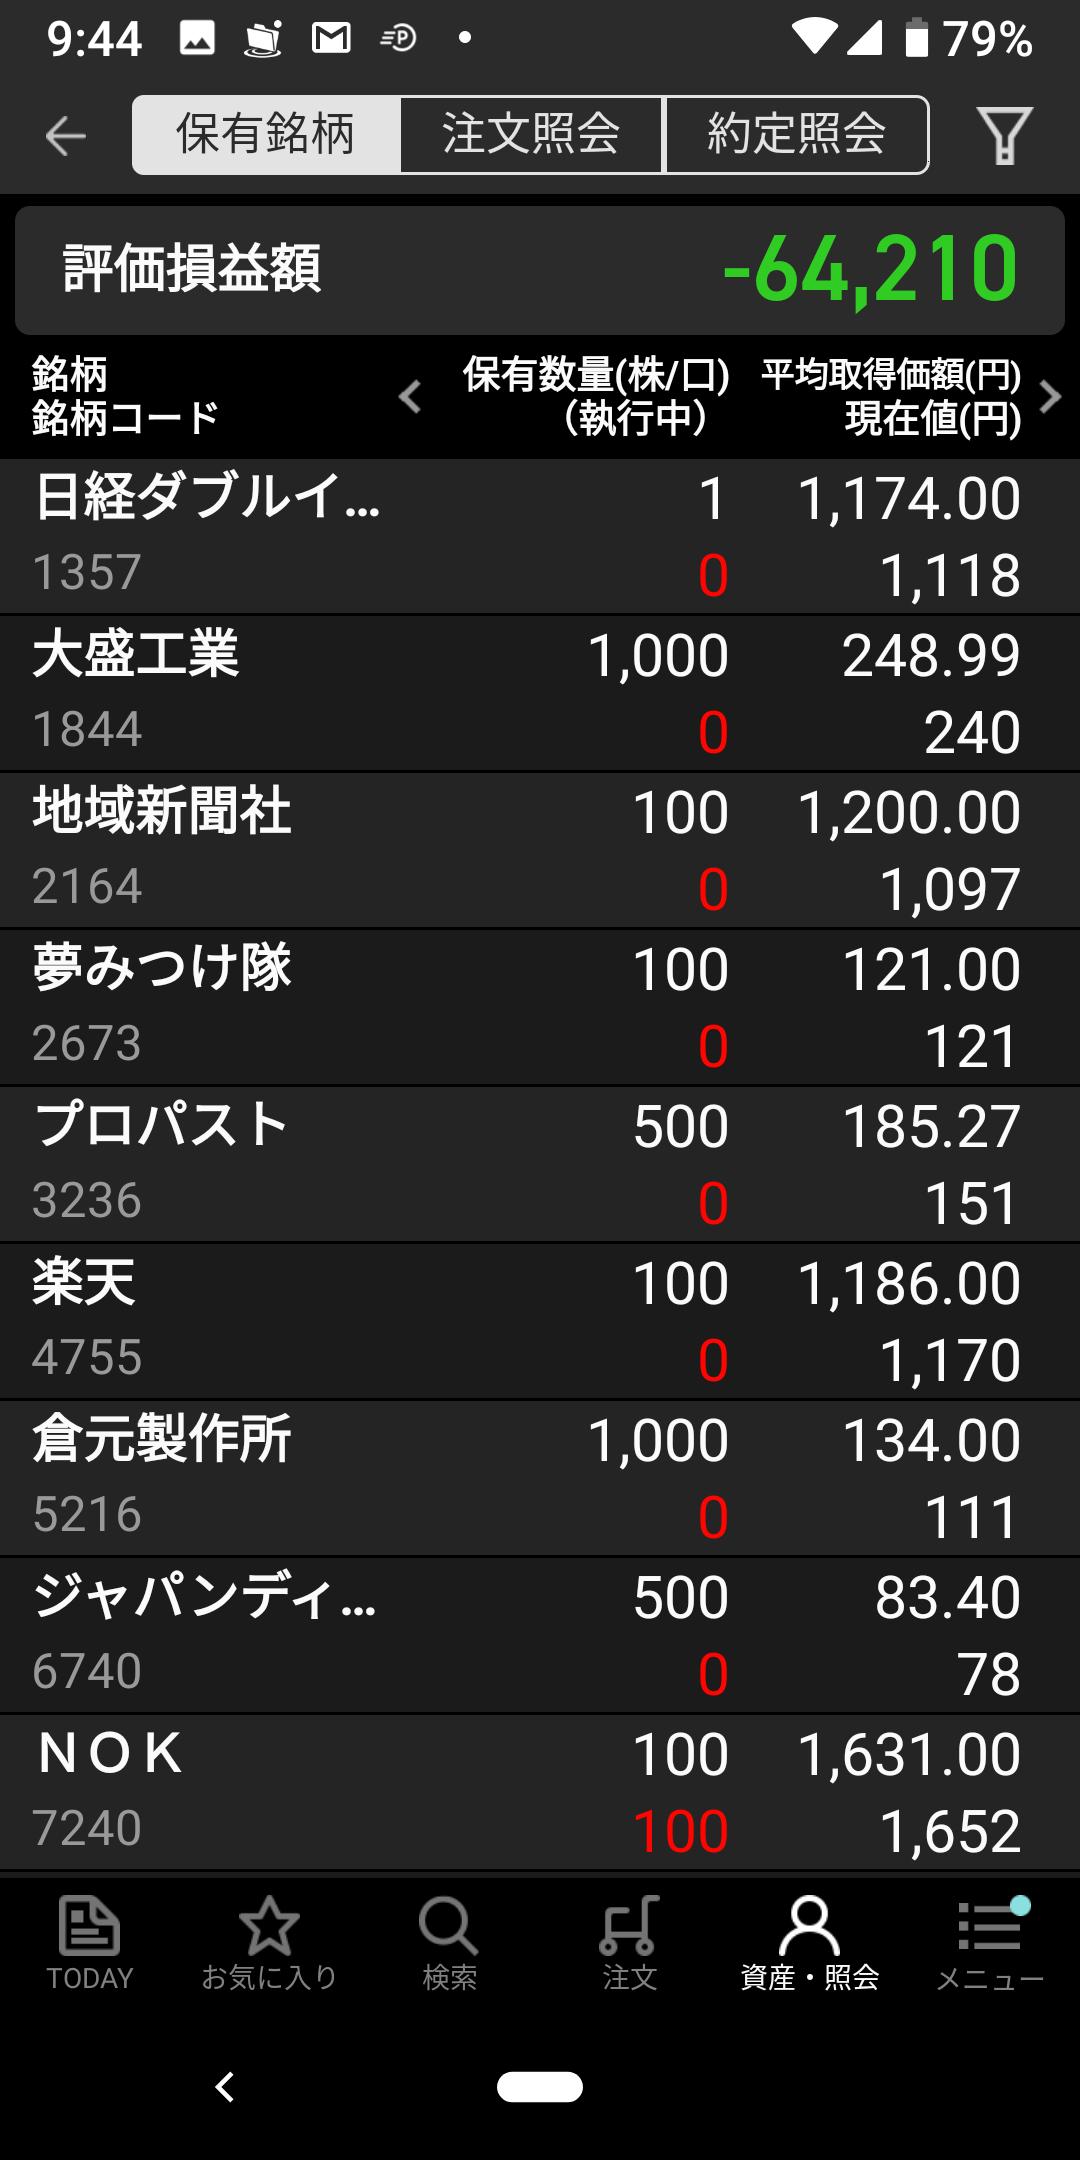 Screenshot (2019_07_16 9_44_42)